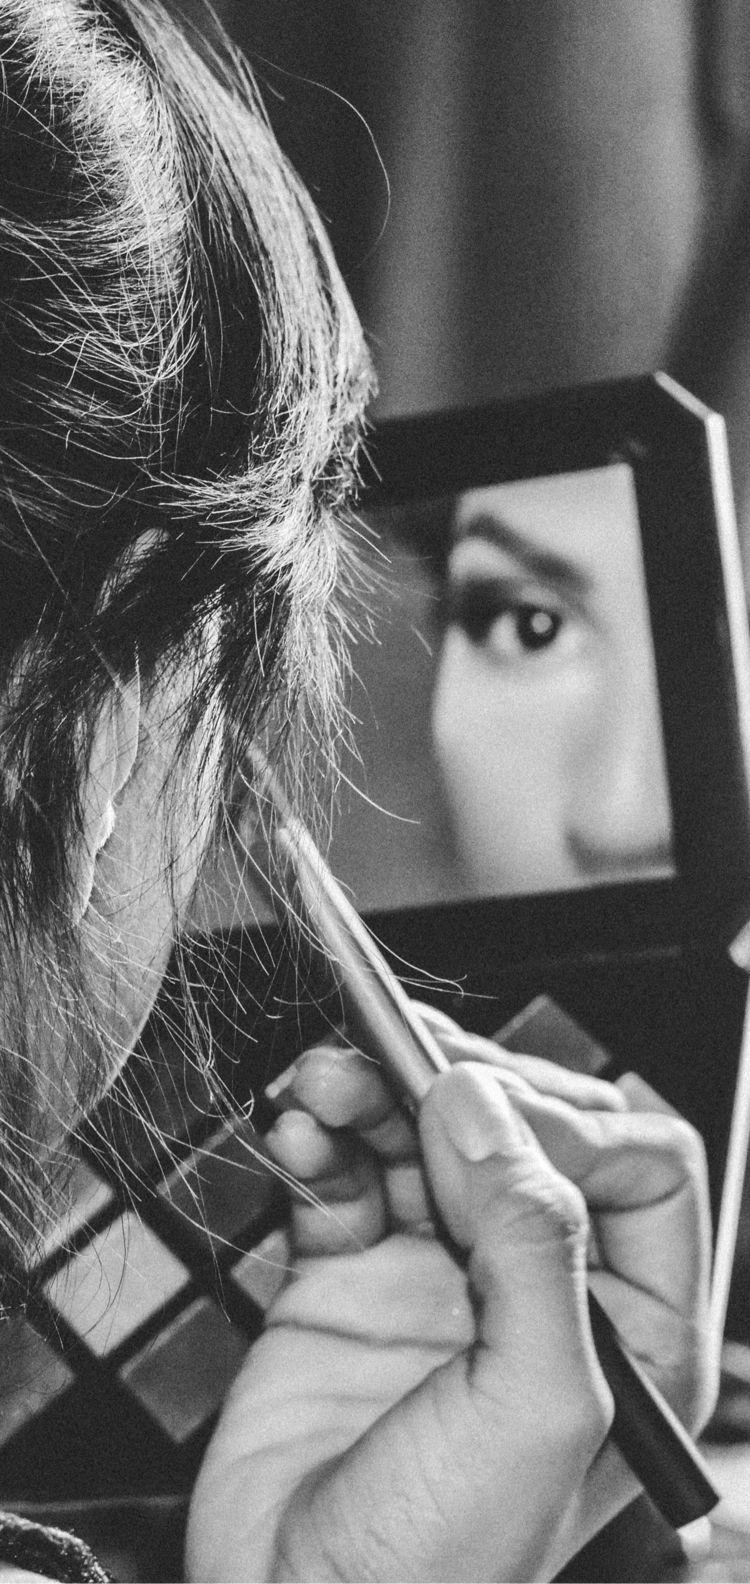 makeuptutorial, makeup, artist - nappyleaf | ello